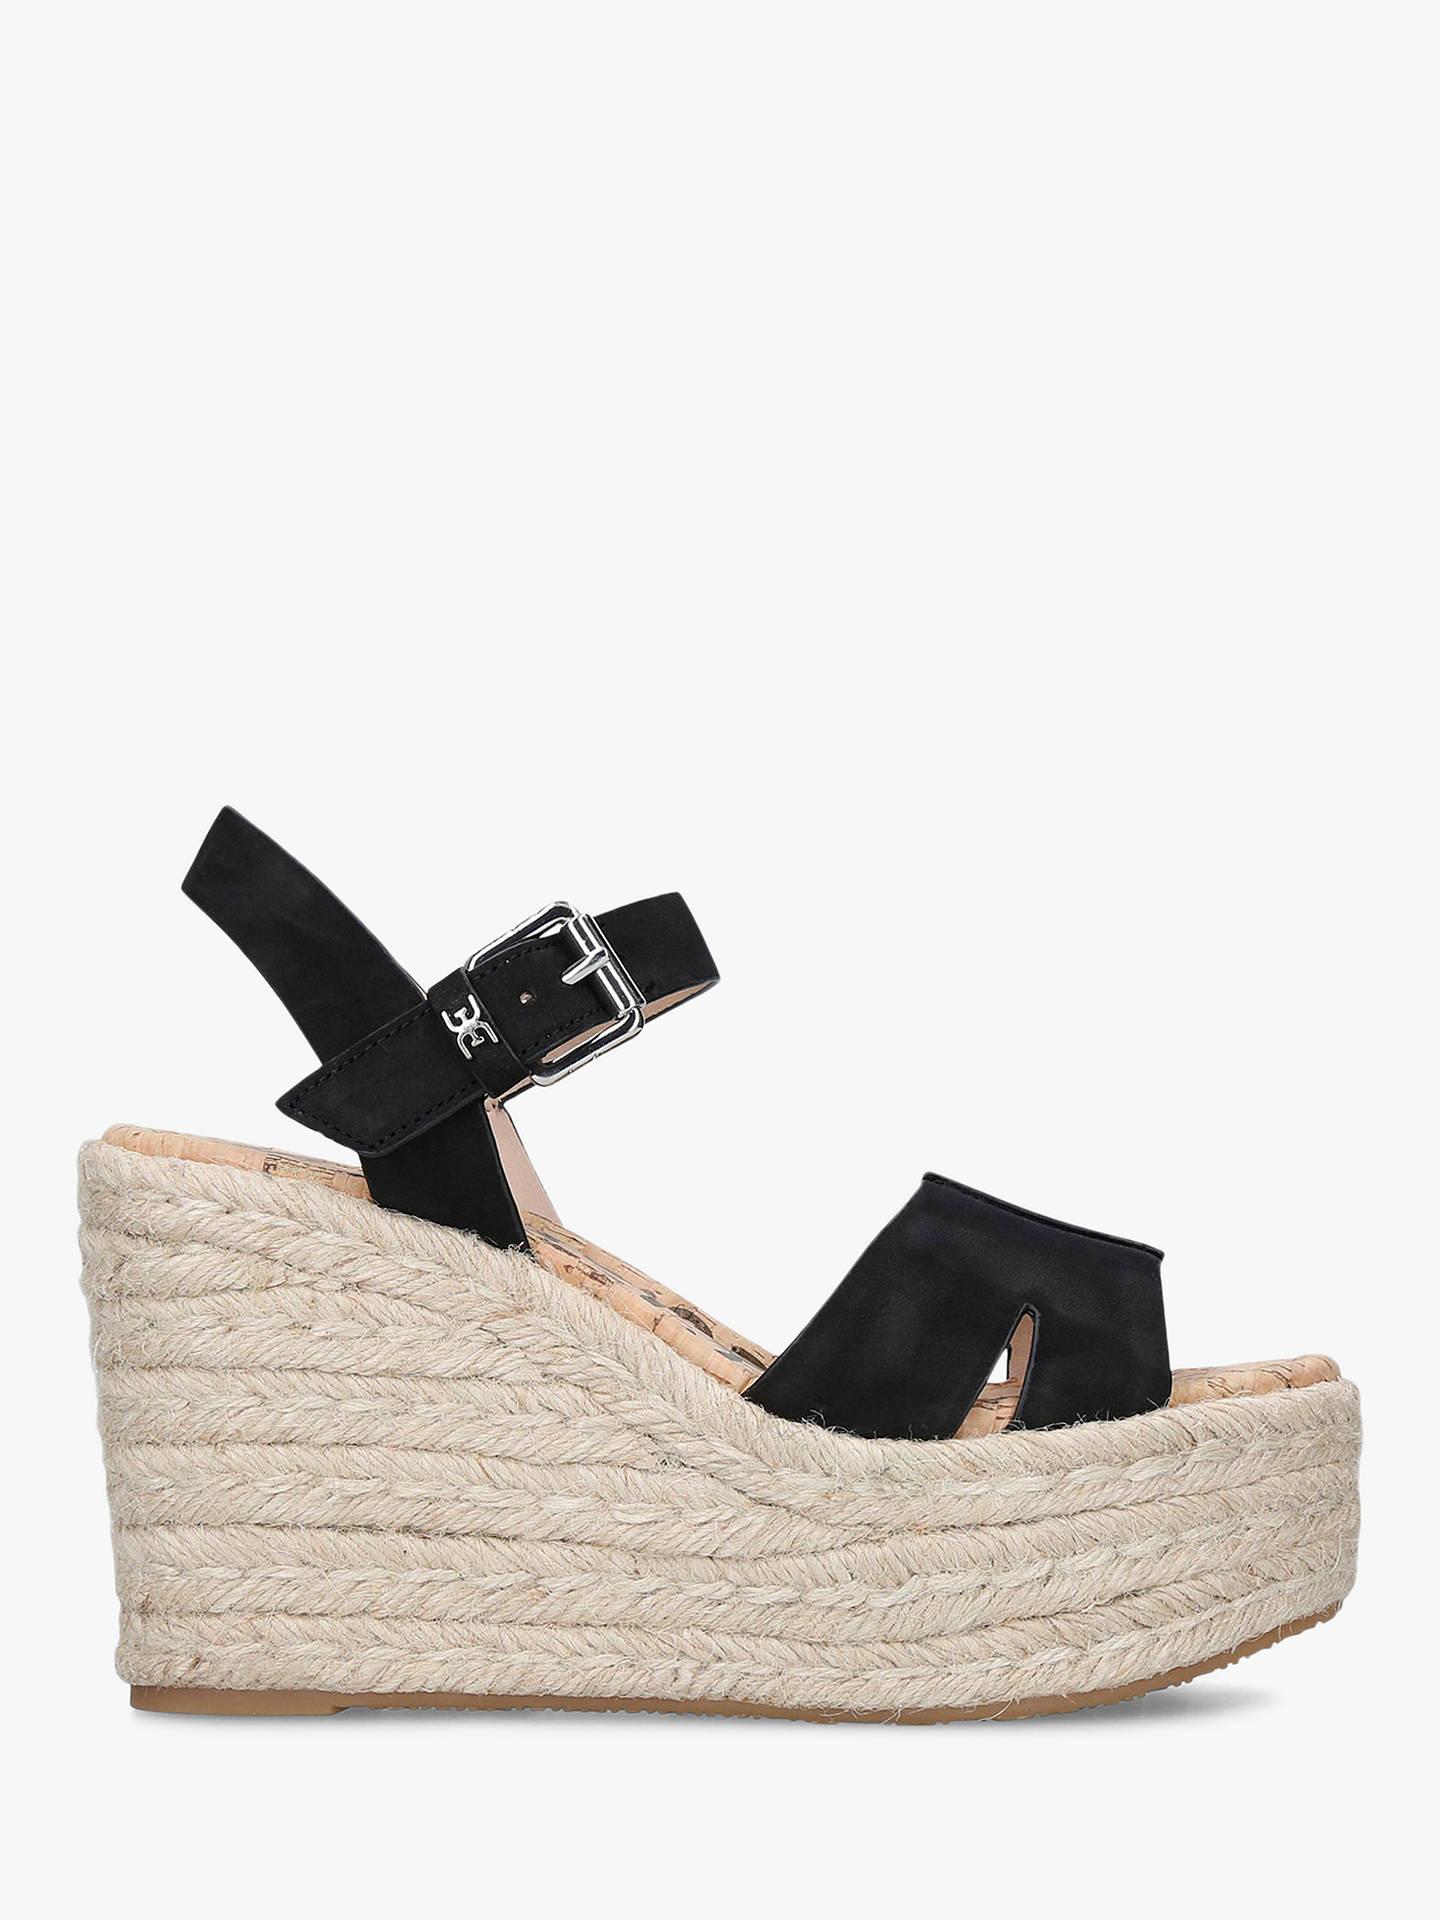 49919f52842 Buy Sam Edelman Maura Wedge Sandals